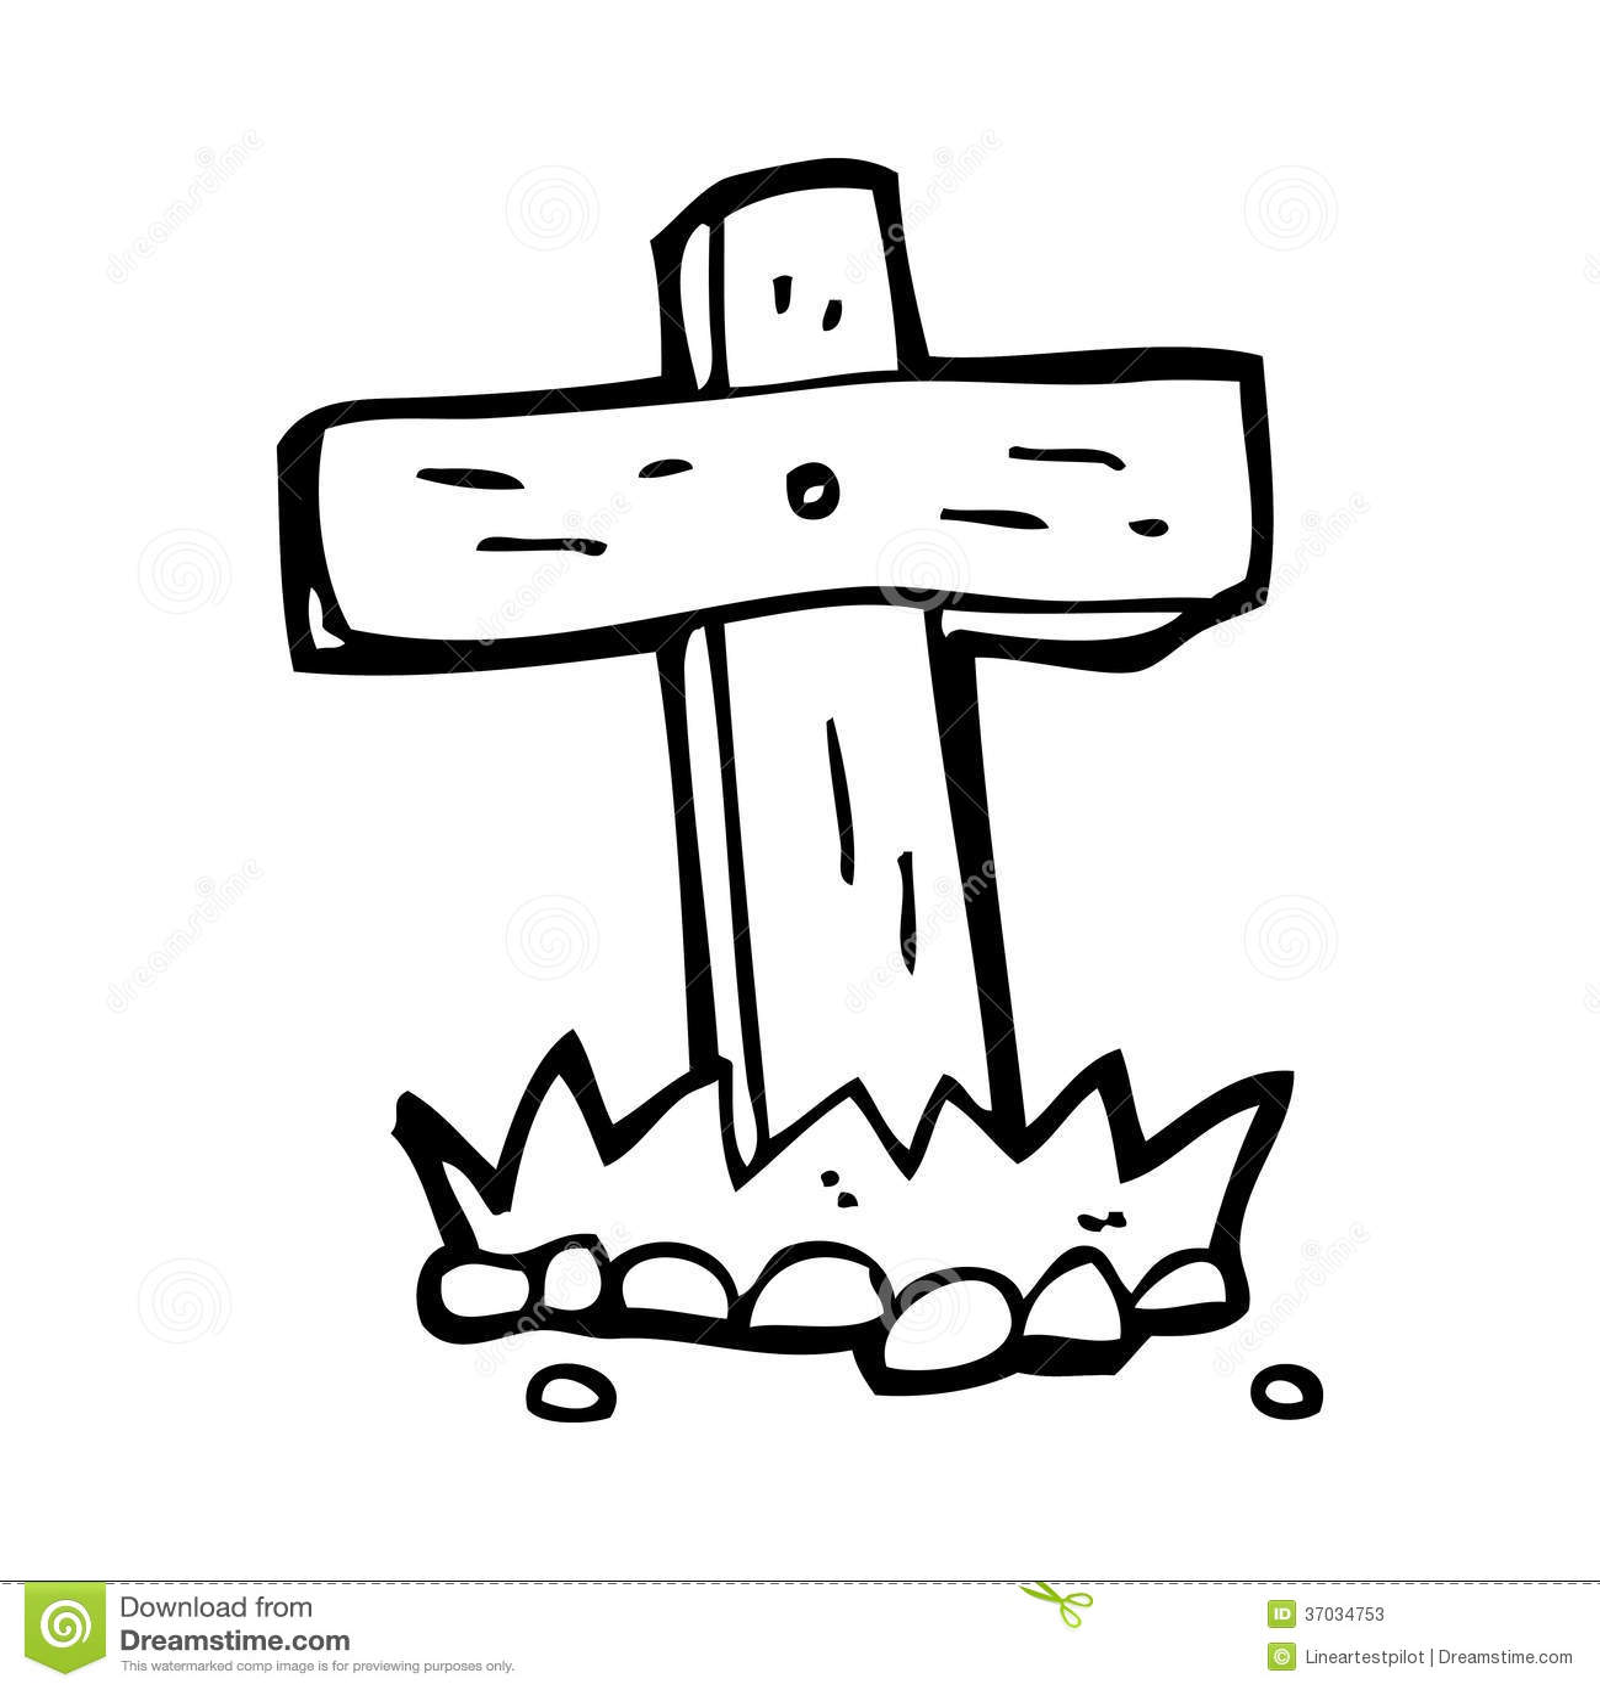 Cartoon Wooden Cross Grave Stock Illustration Image Of